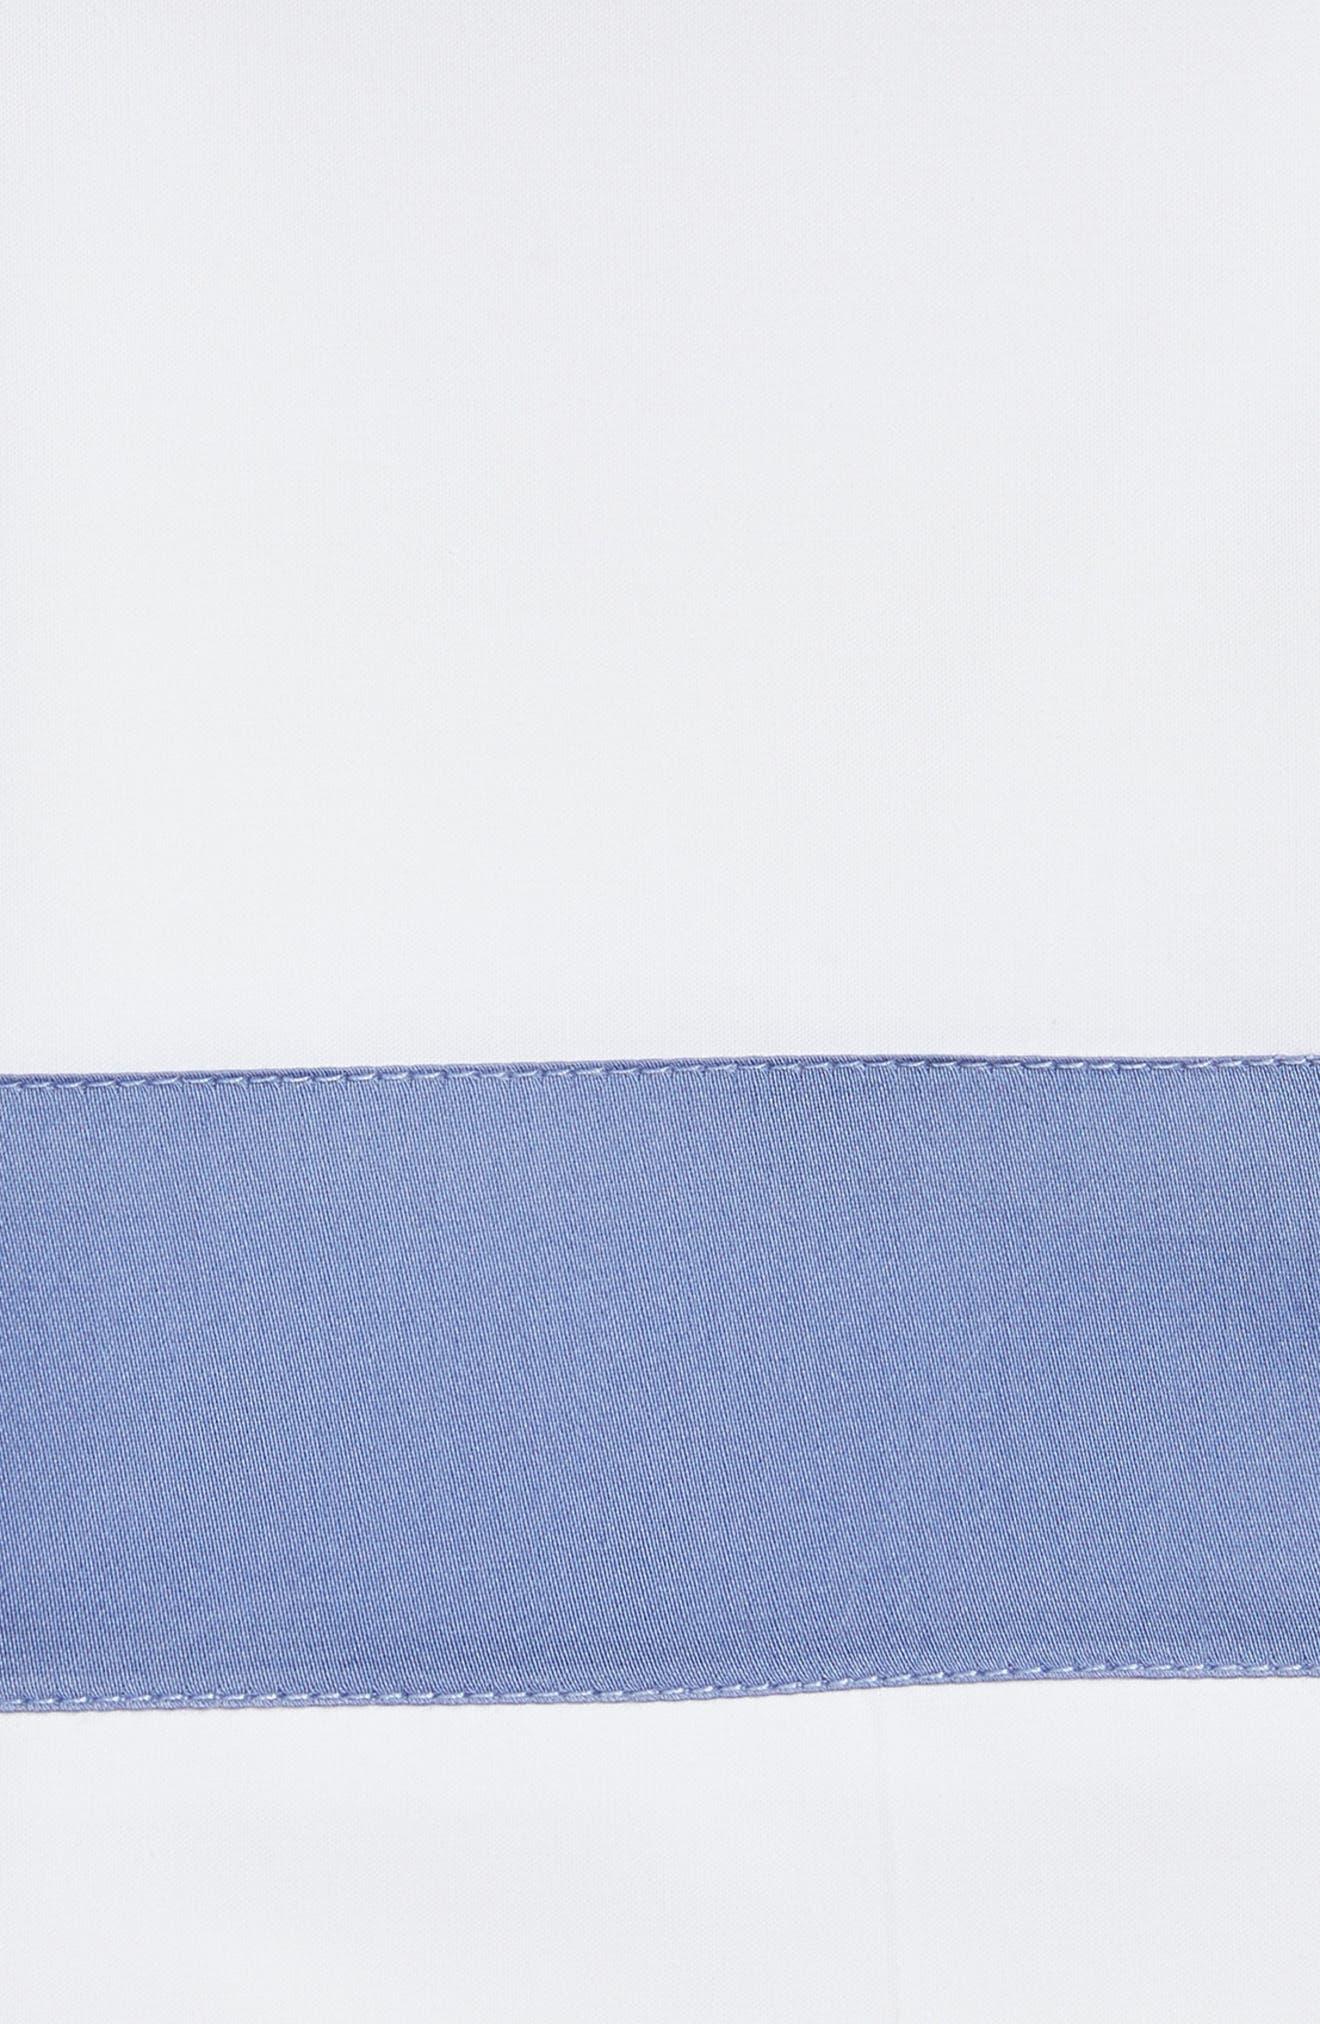 Orlo Pillowcase,                             Alternate thumbnail 2, color,                             White/ Cornflower